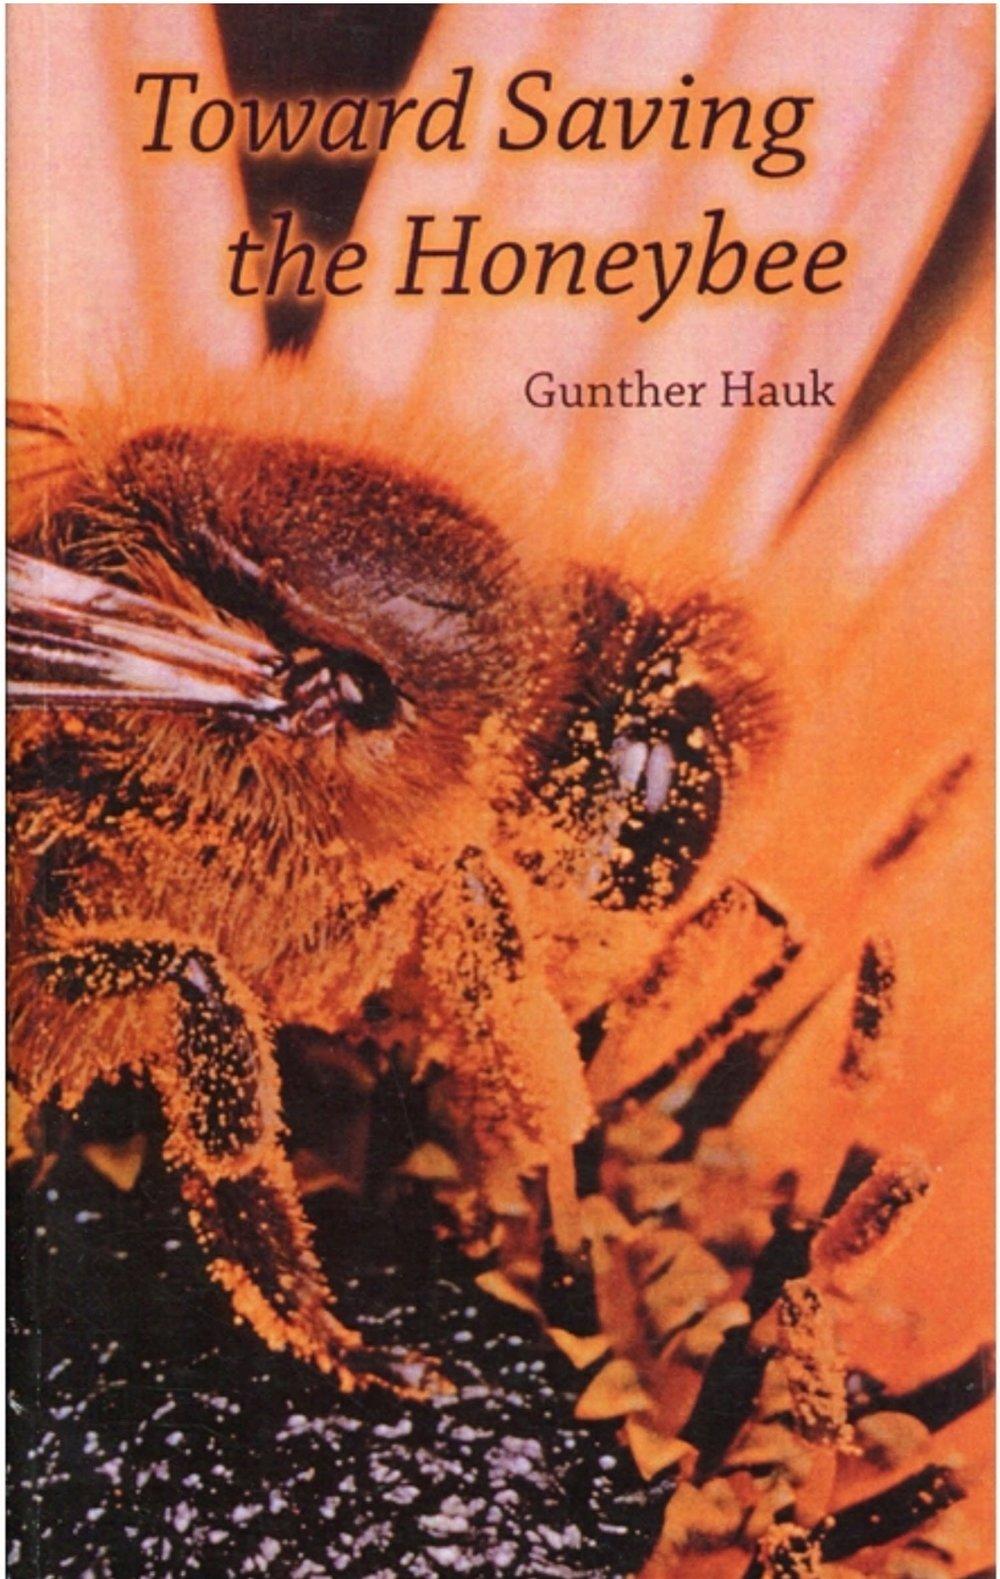 Toward Saving the Honeybee.jpg